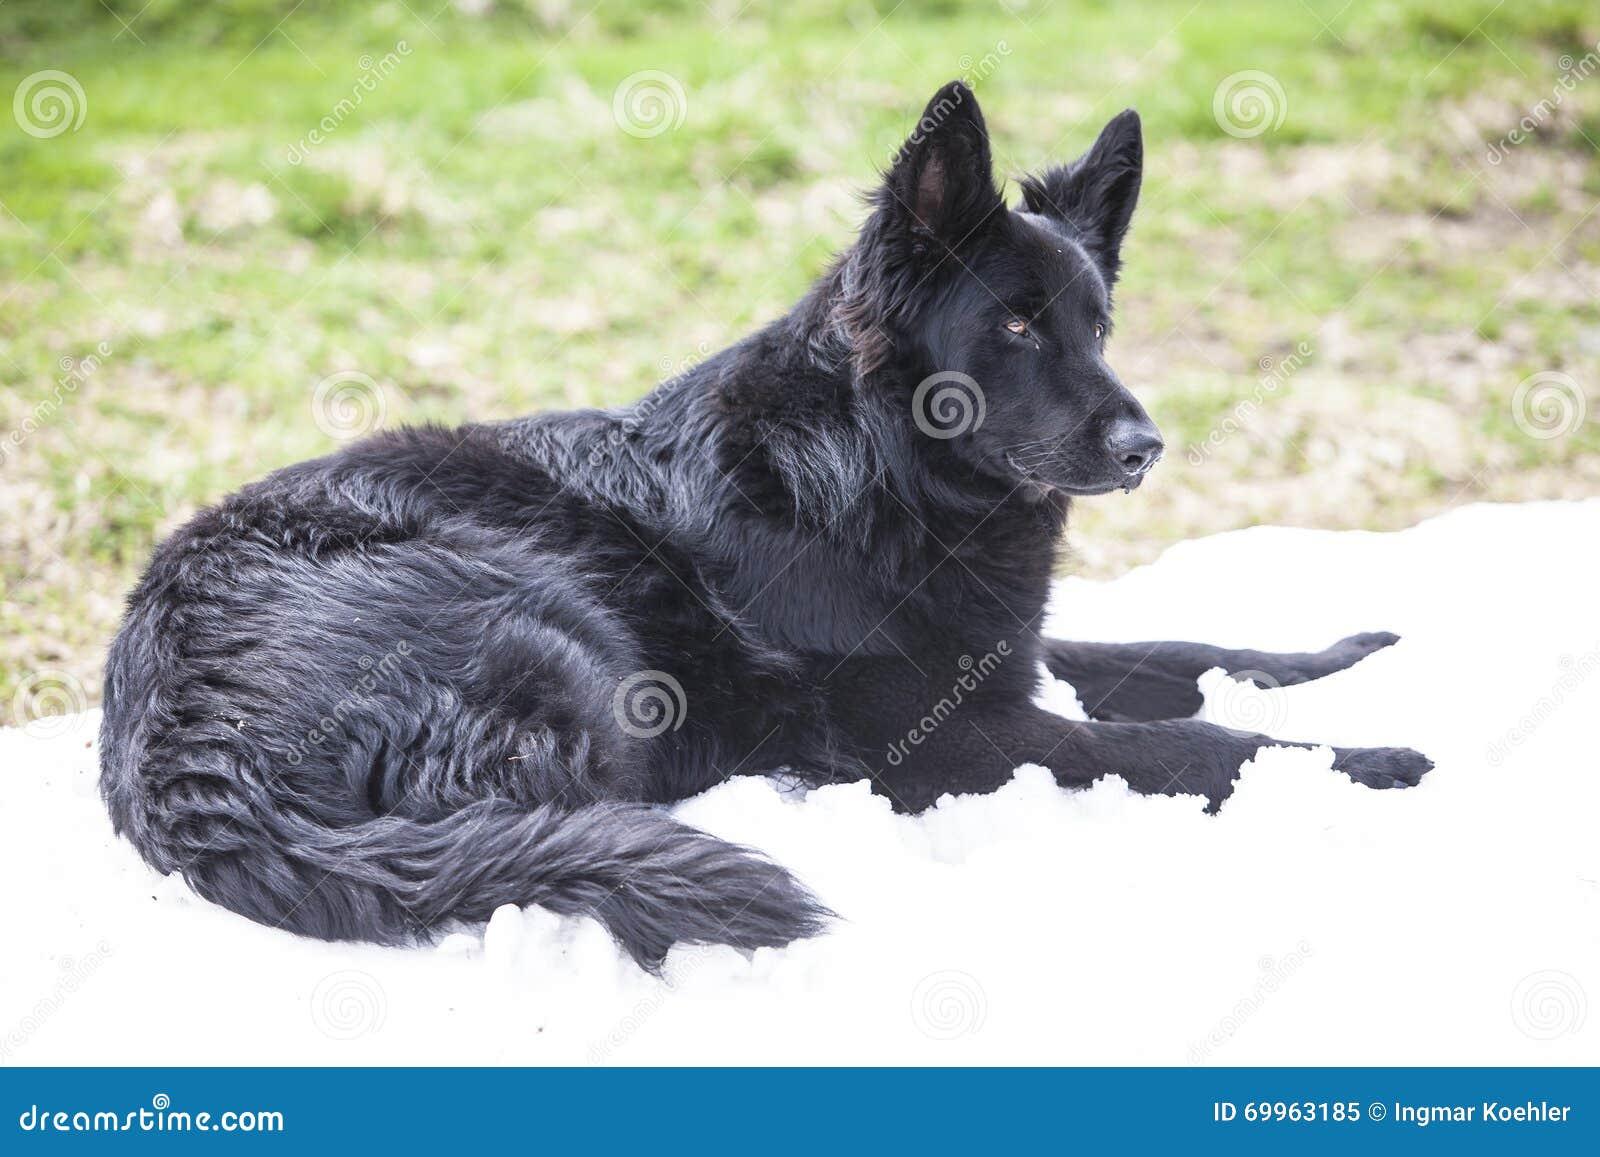 Black German Shepherd Dog Stock Image Image Of Clever 69963185